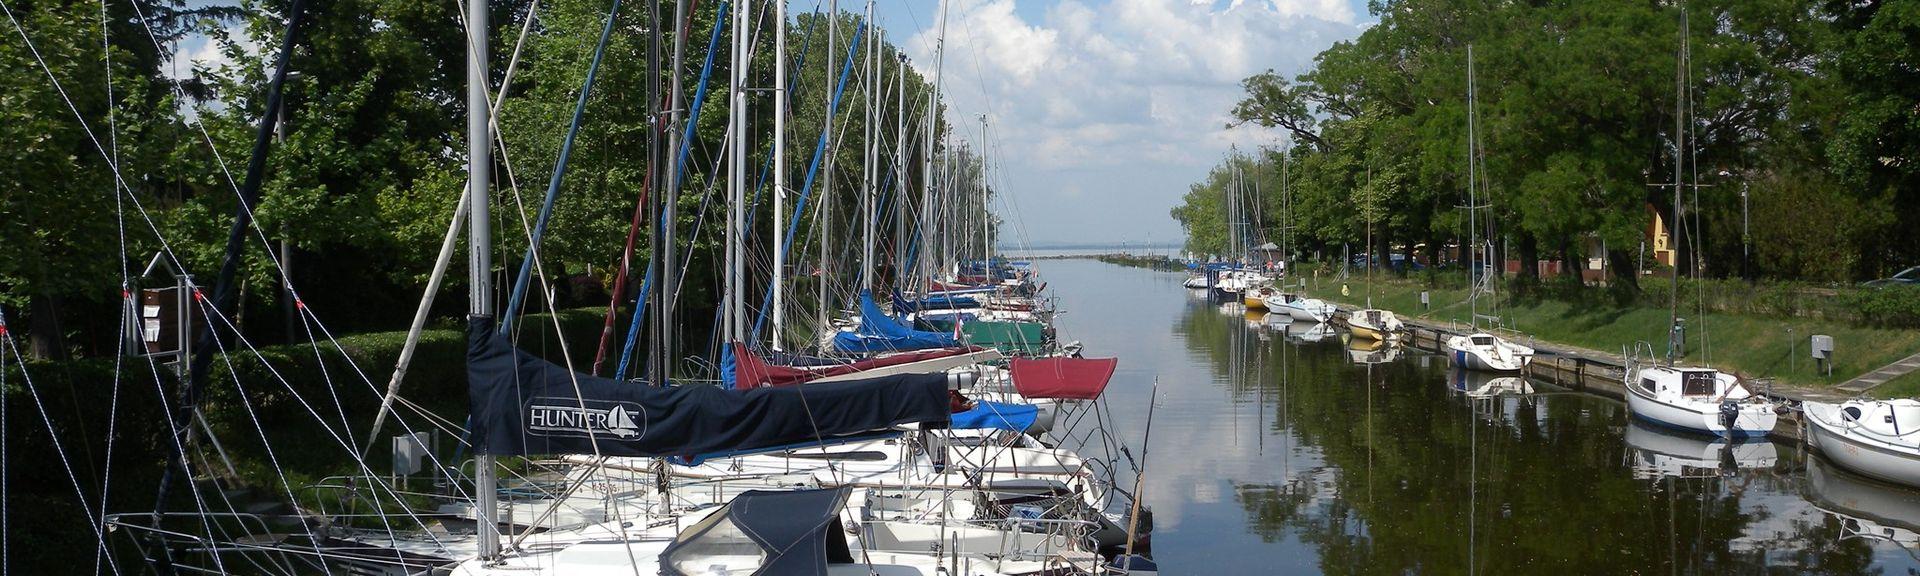 Somogy County, Hungary